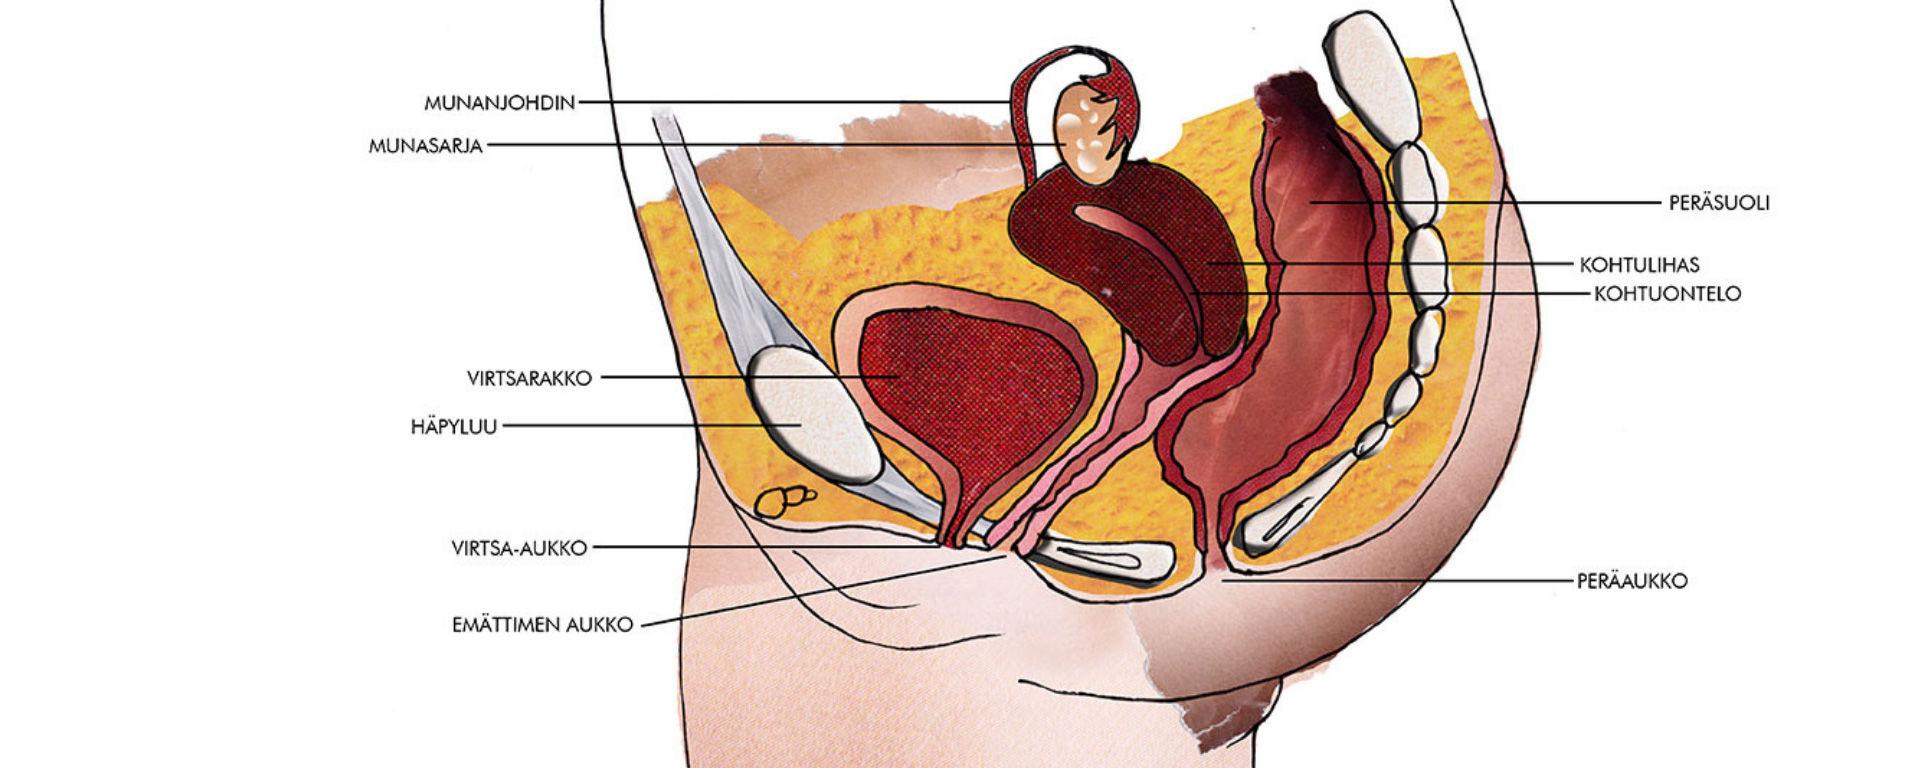 Emättimen anatomia -piirroskuva